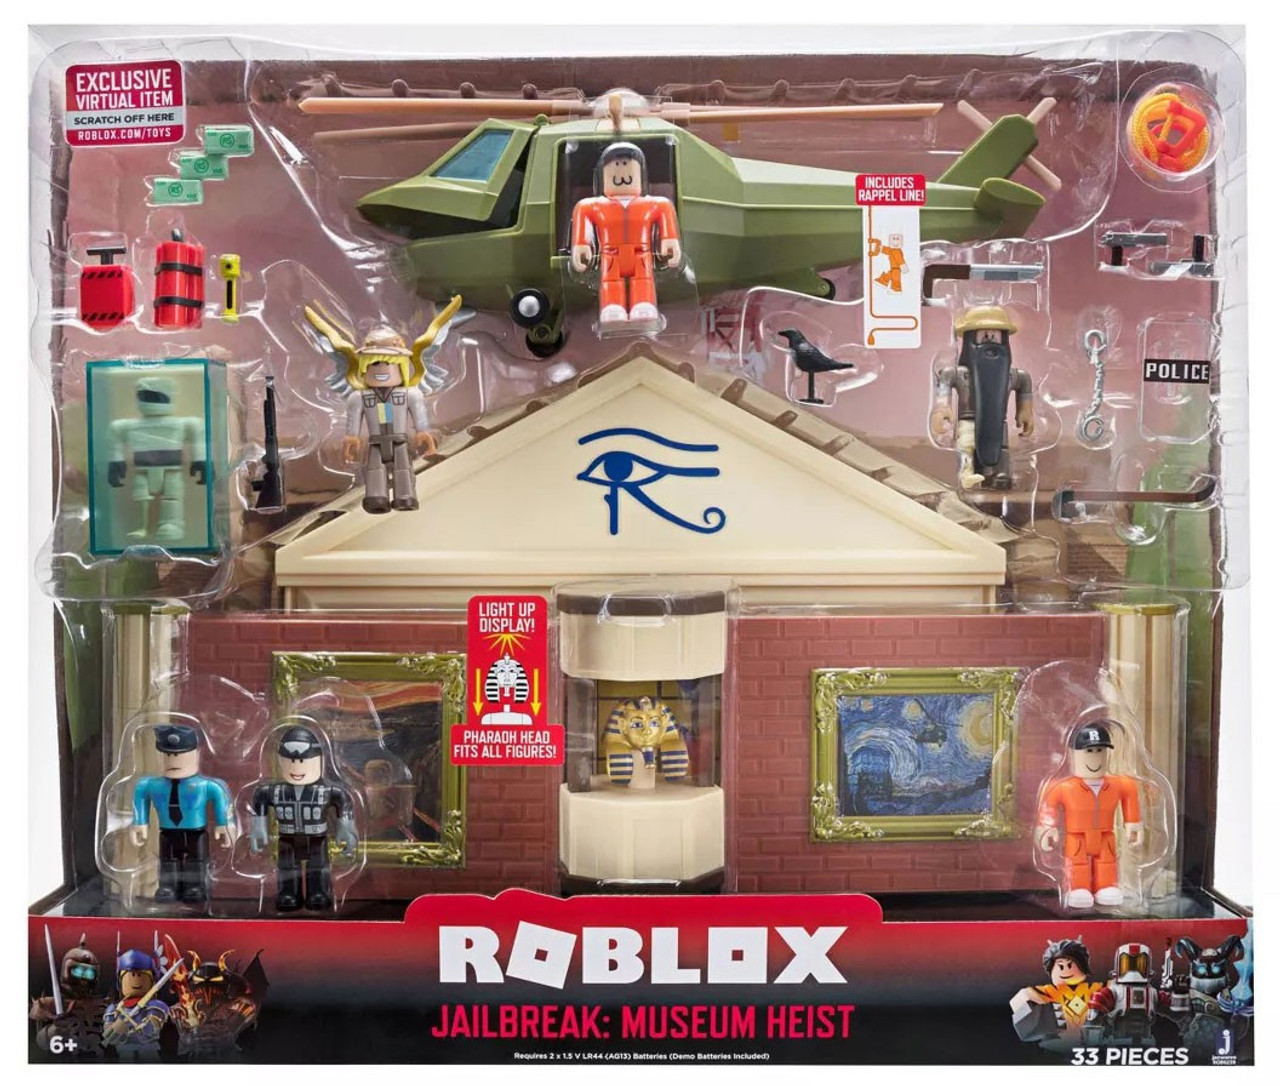 Roblox Desktop Series Jailbreak Museum Heist 3 Playset Jazwares Toywiz